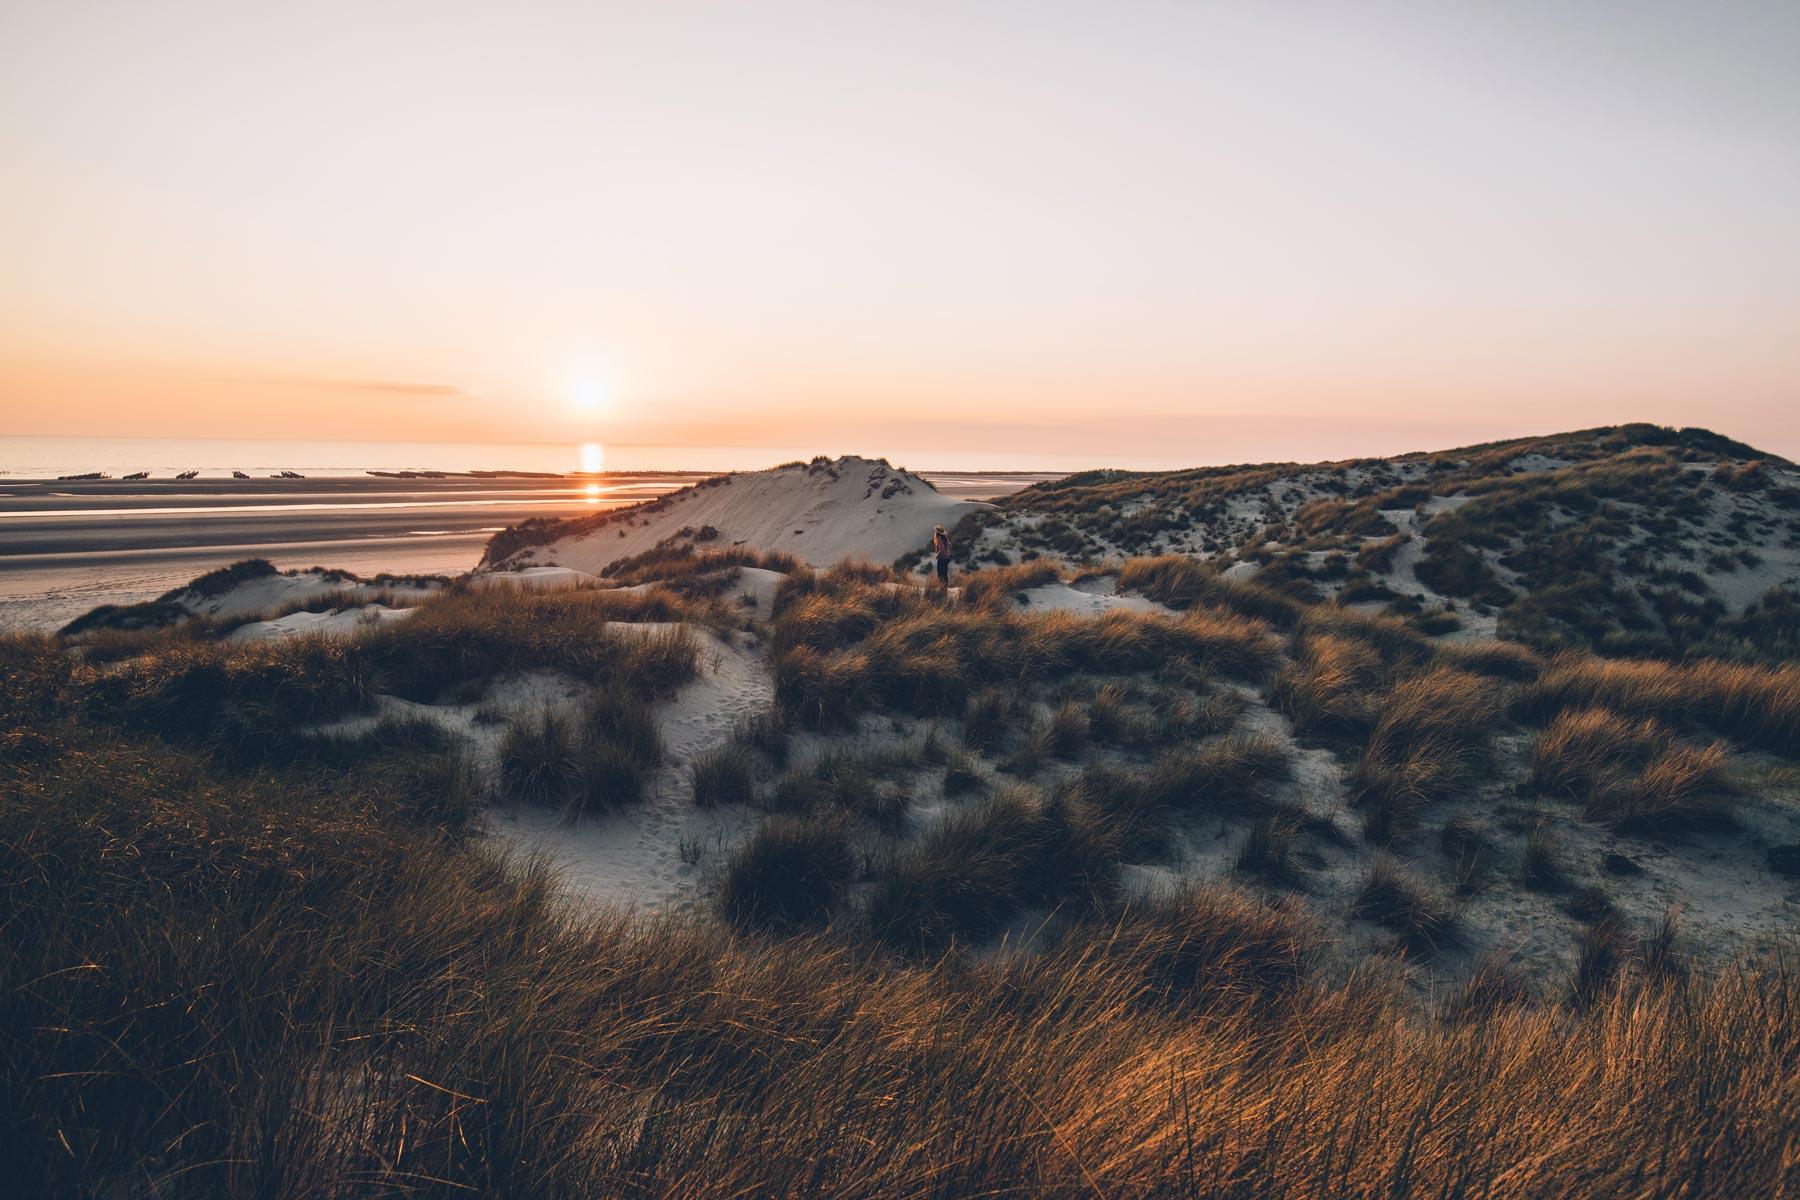 Dunes de sable, Baie de Somme